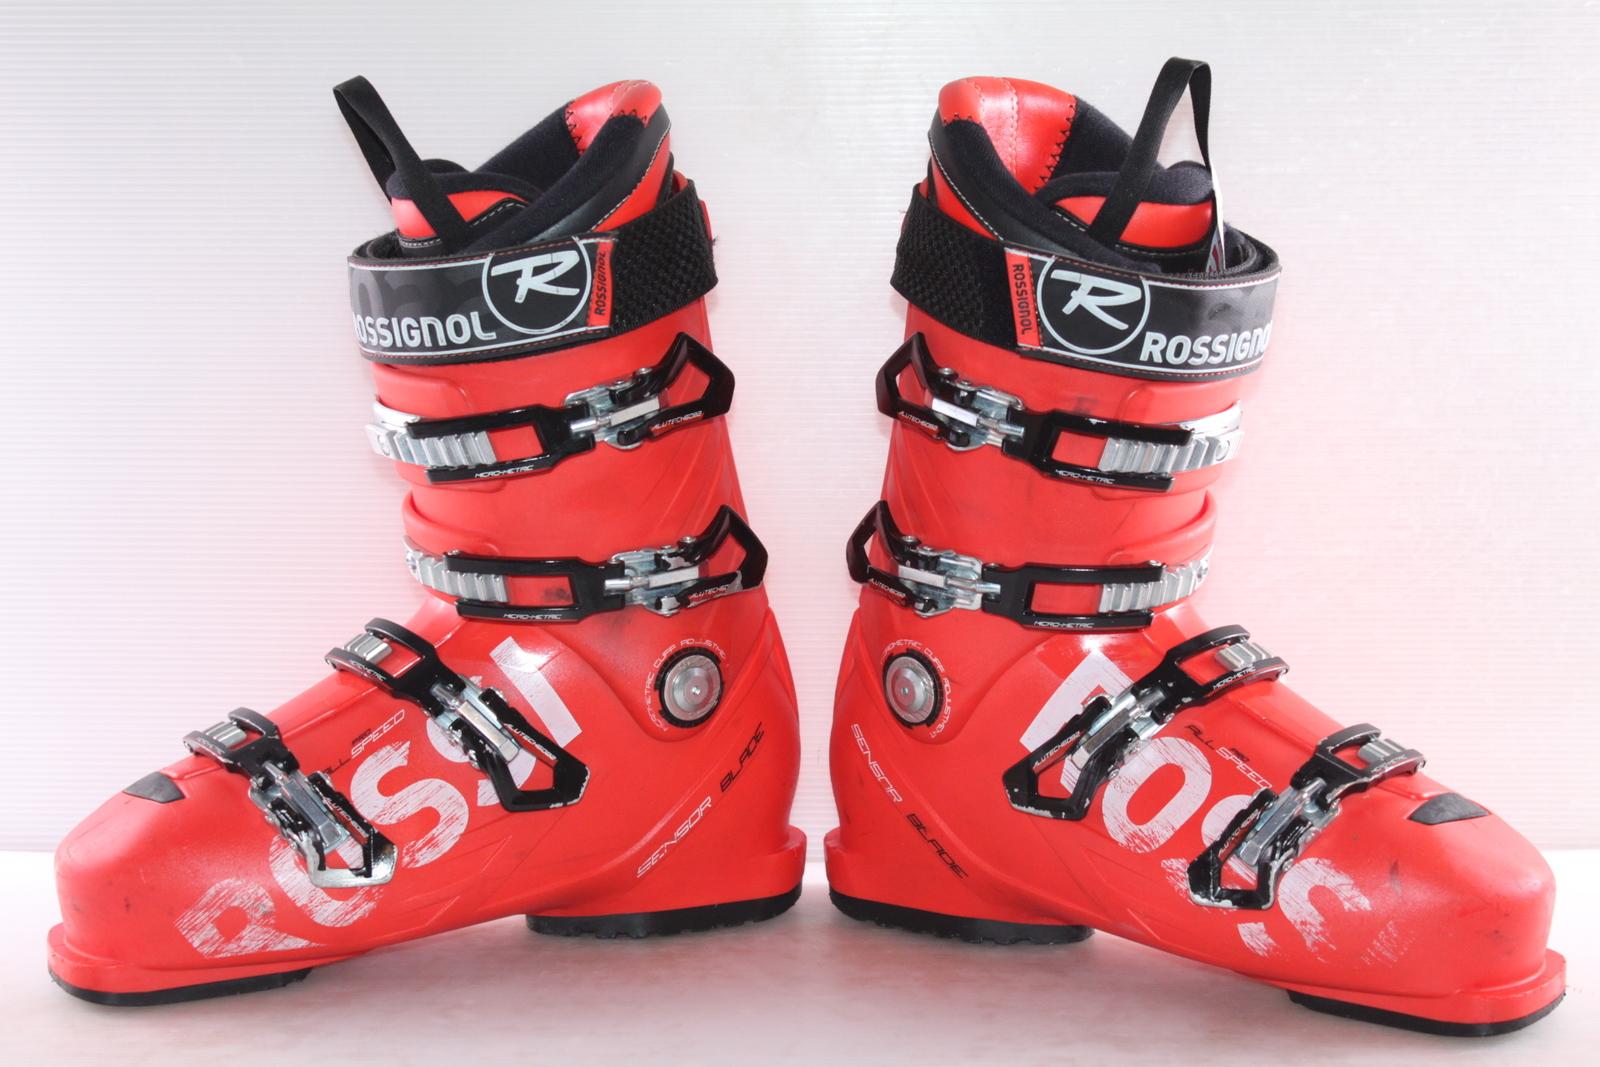 Lyžařské boty Rossignol All Speed Pro vel. EU42 flexe 100